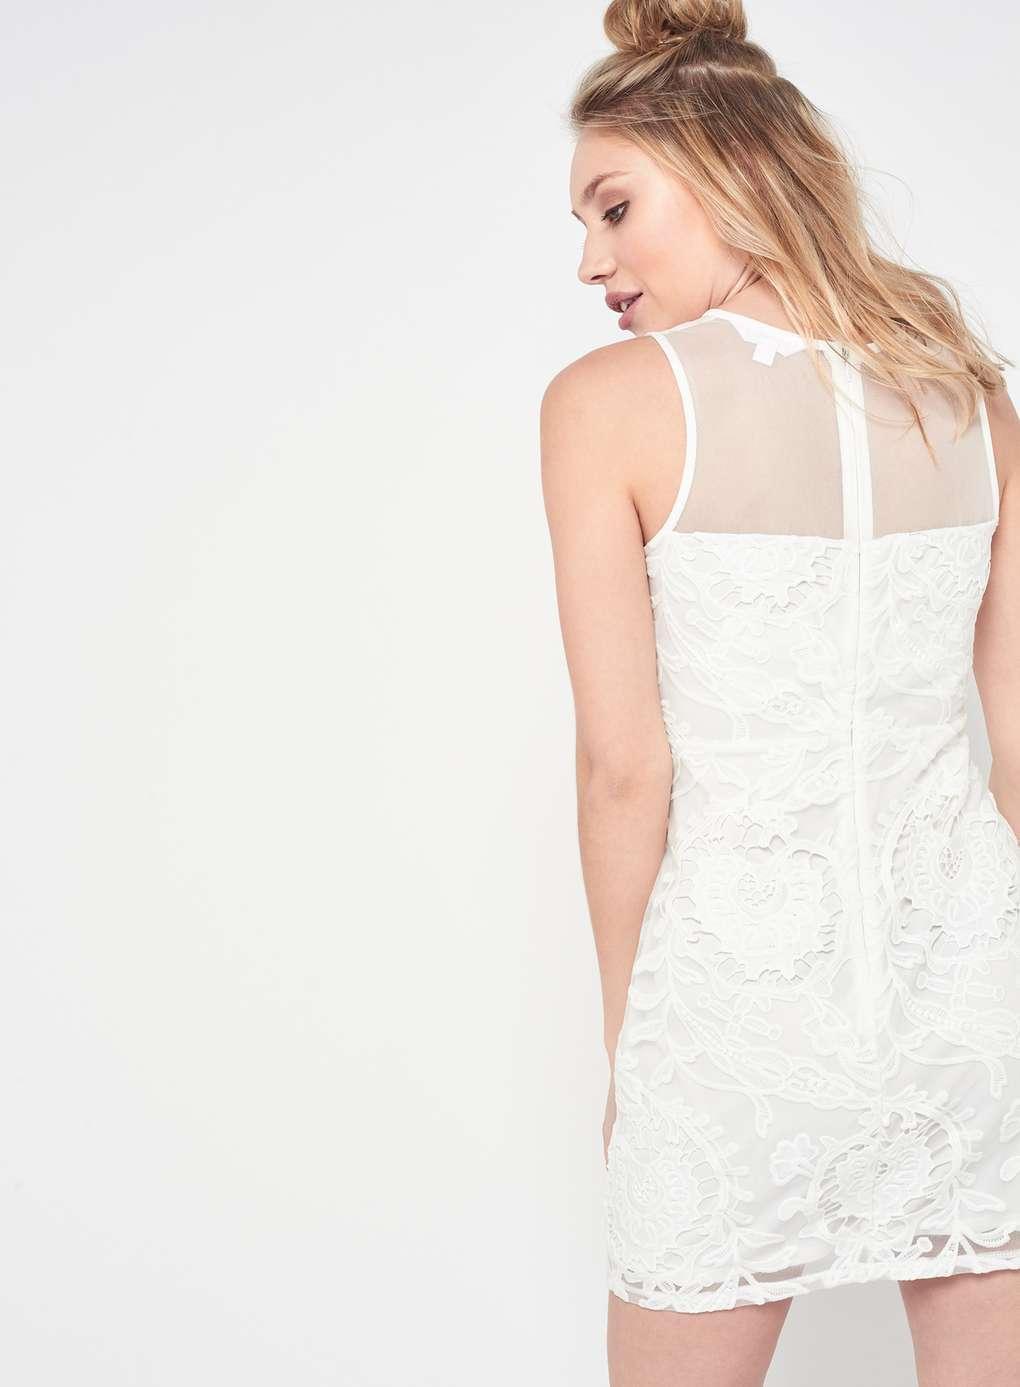 Modern Used Wedding Dresses Chicago Gift - Wedding Dress Ideas ...